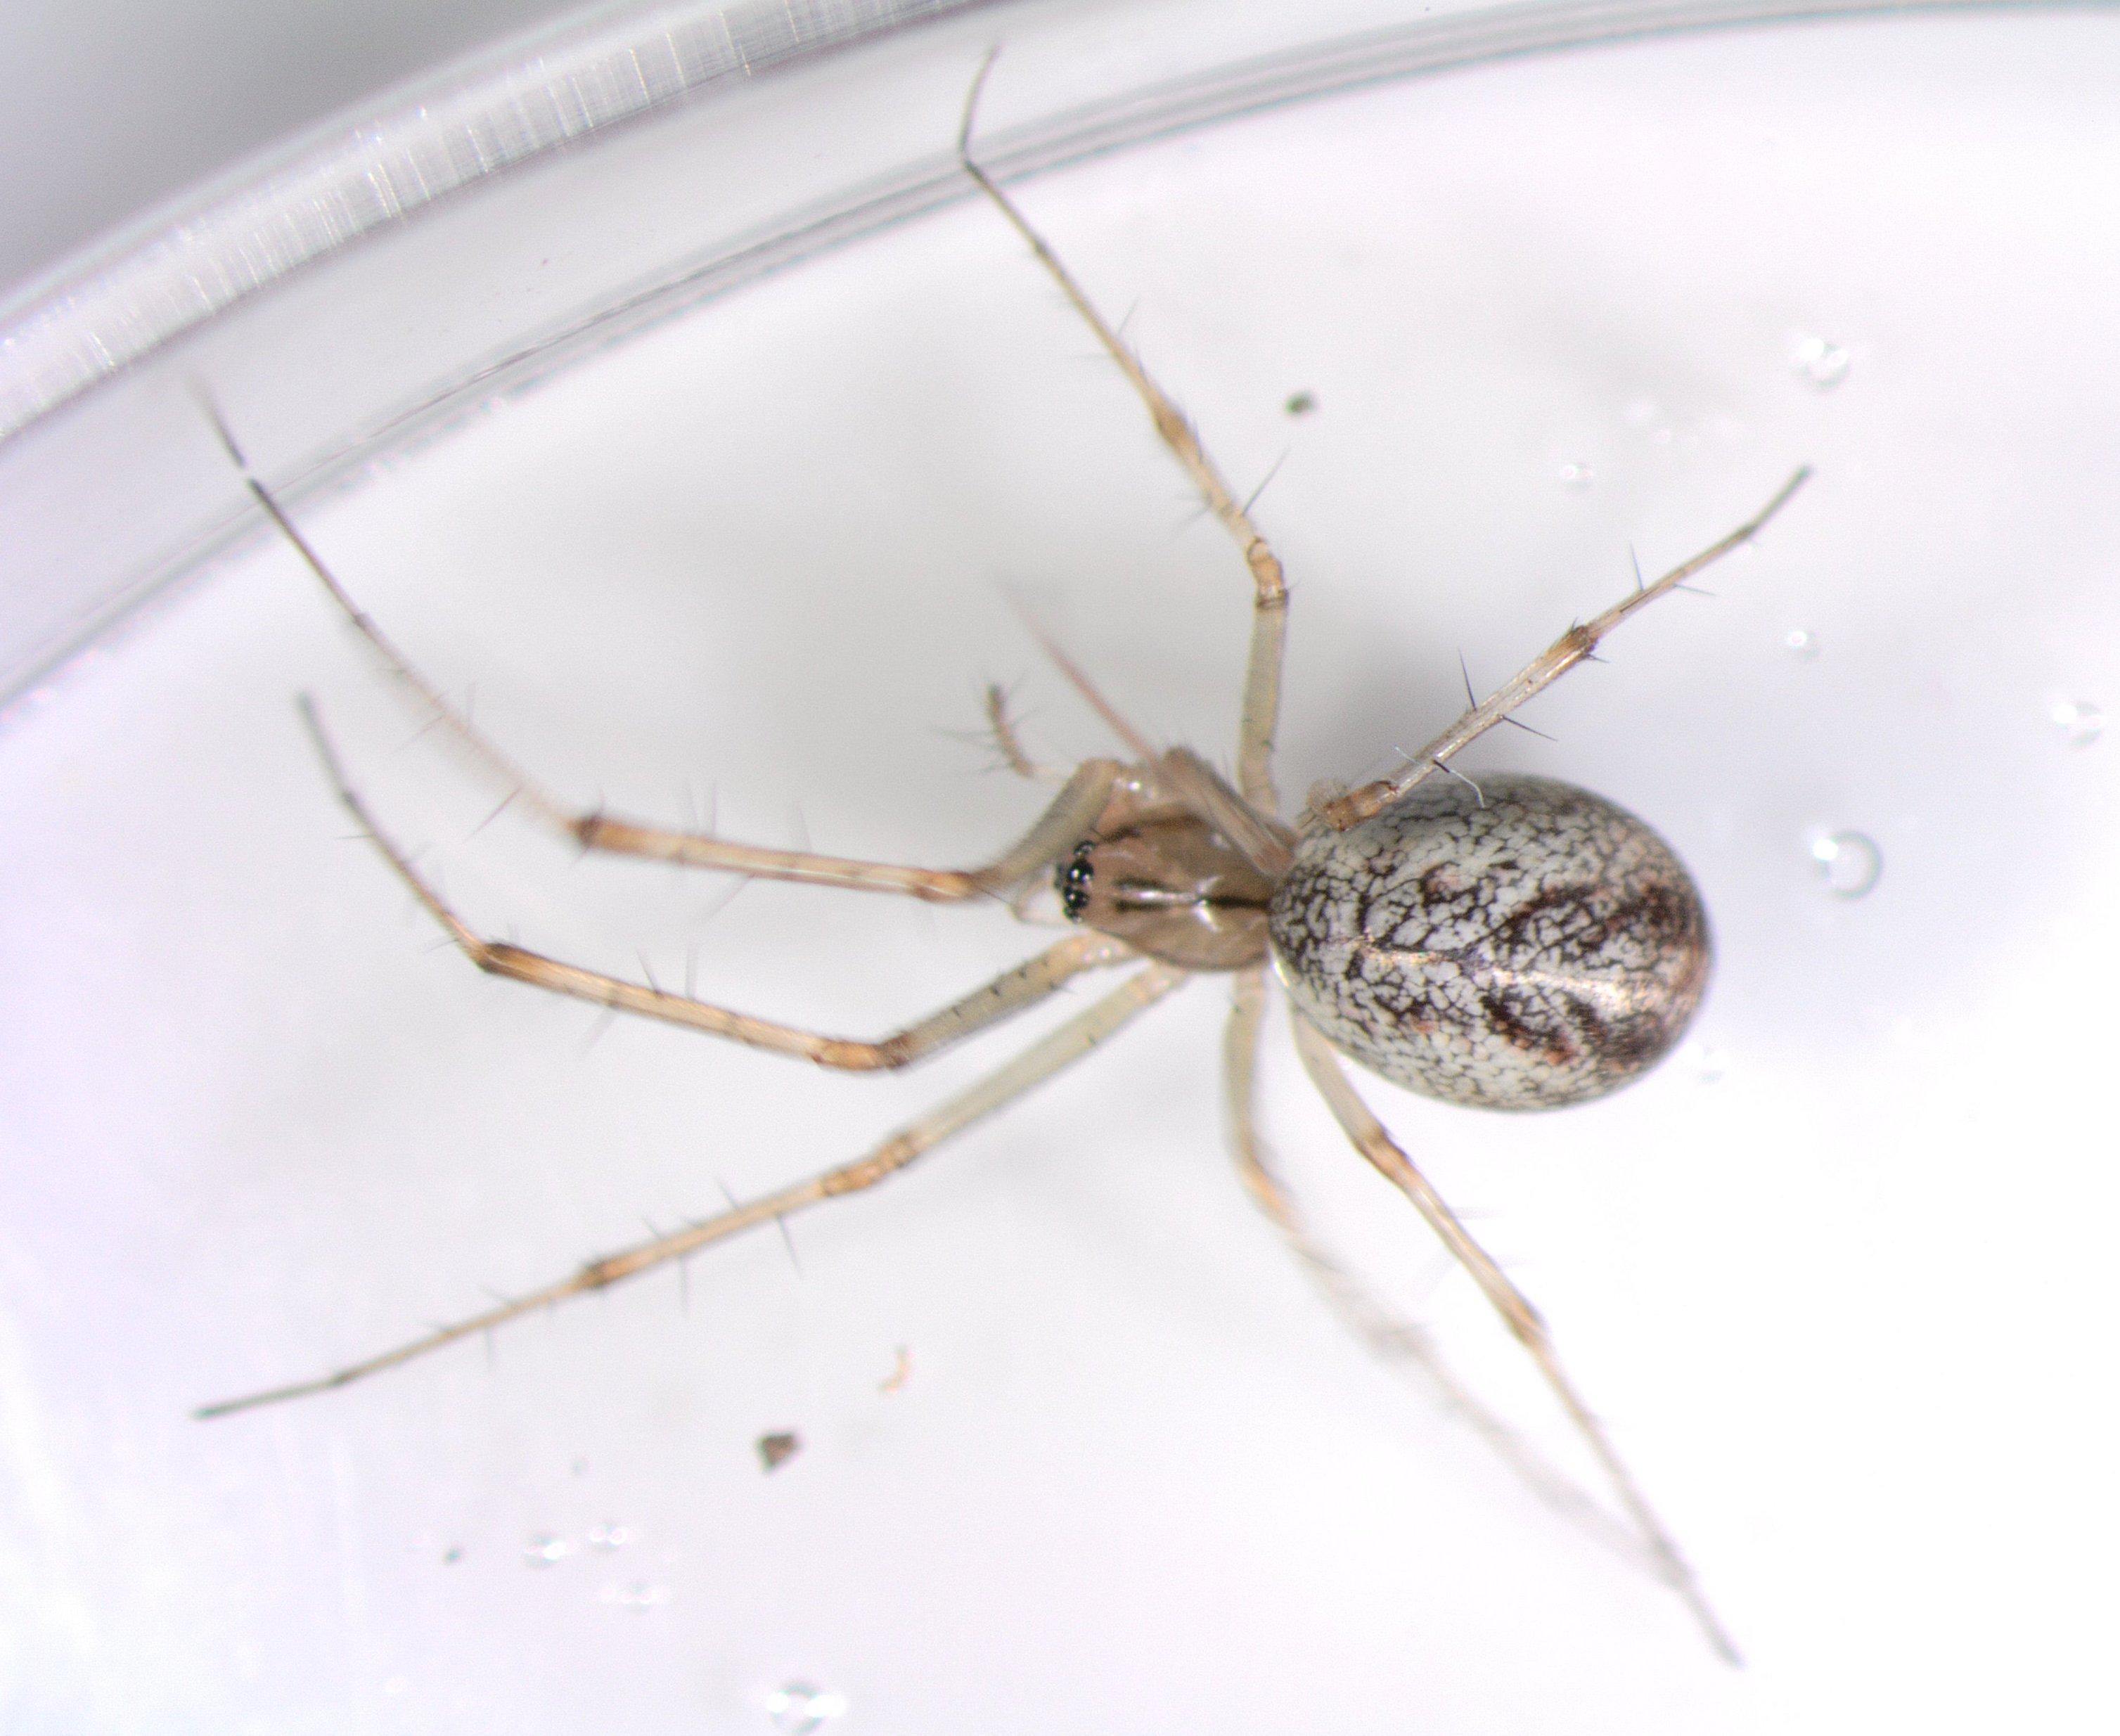 Picture of Linyphia triangularis (European Sheetweb Spider) - Dorsal